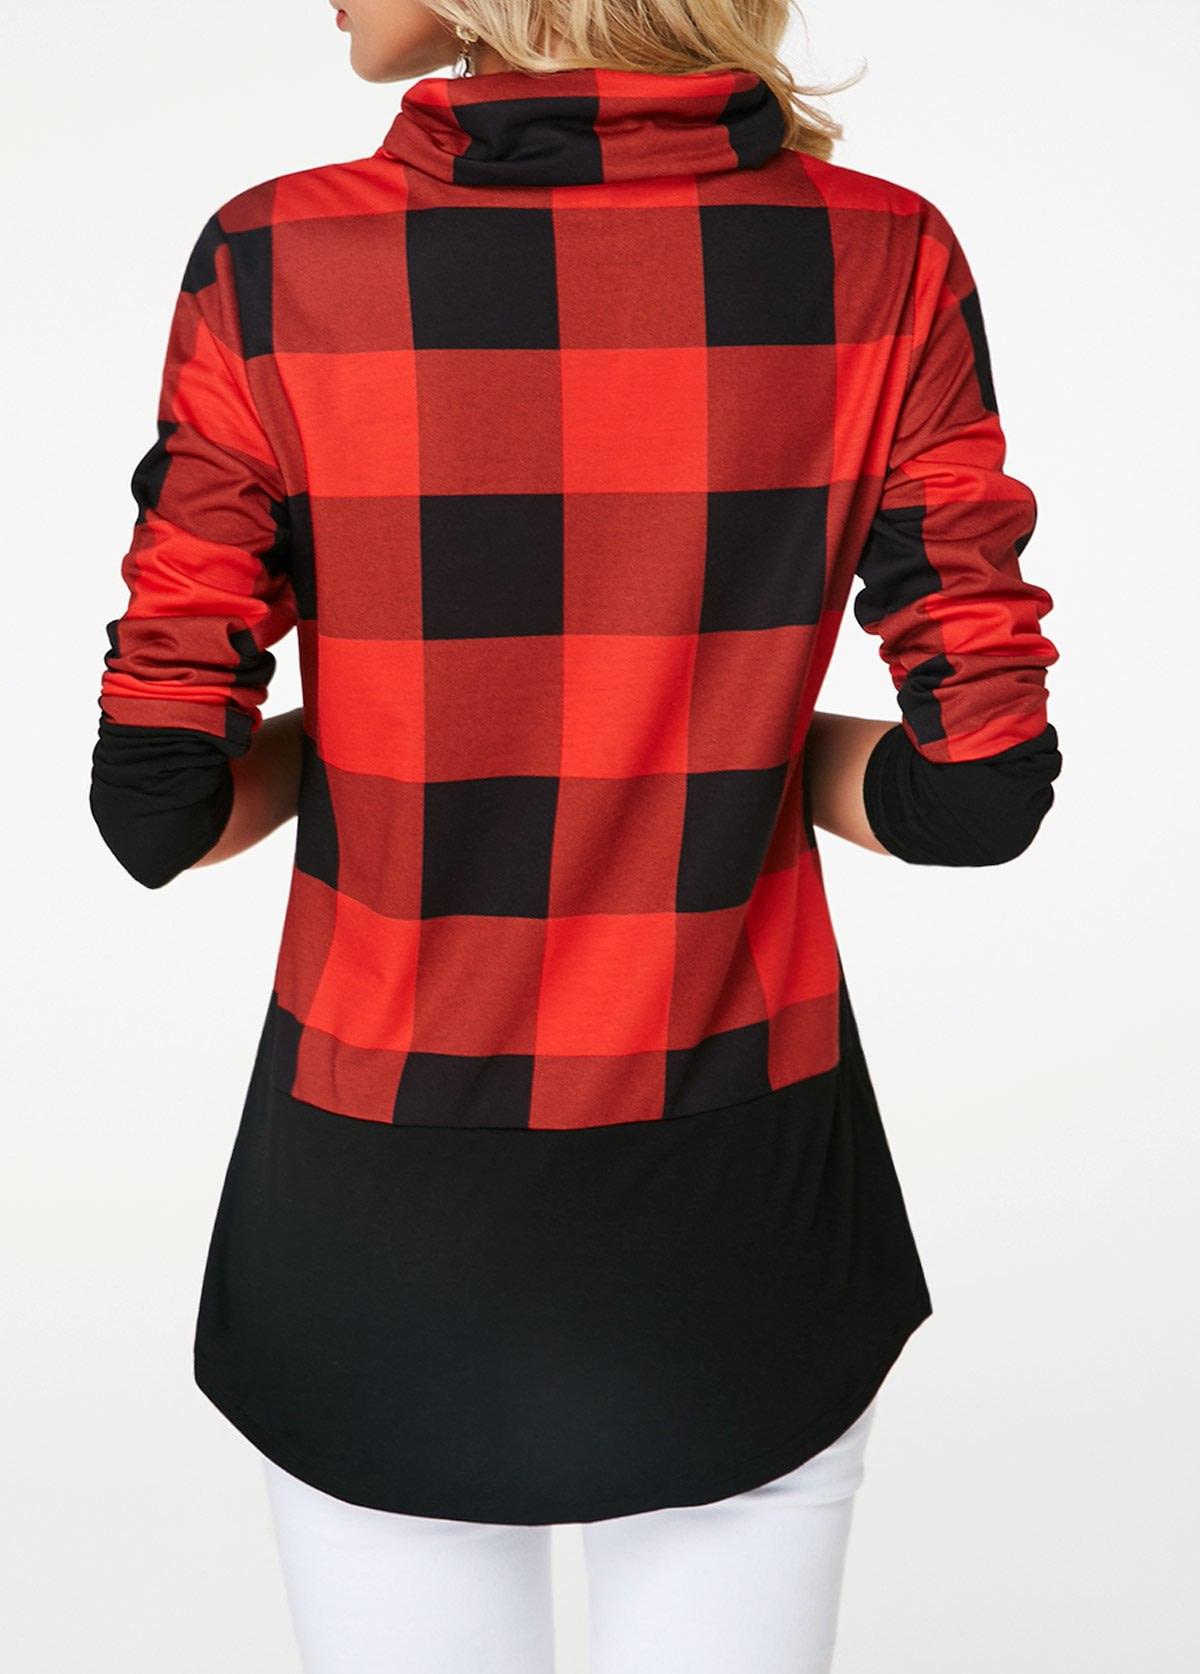 Women's Plaid Print Turtleneck Hoodie, Casual Long Sleeve Women's Plus Size Sweatshirt 7